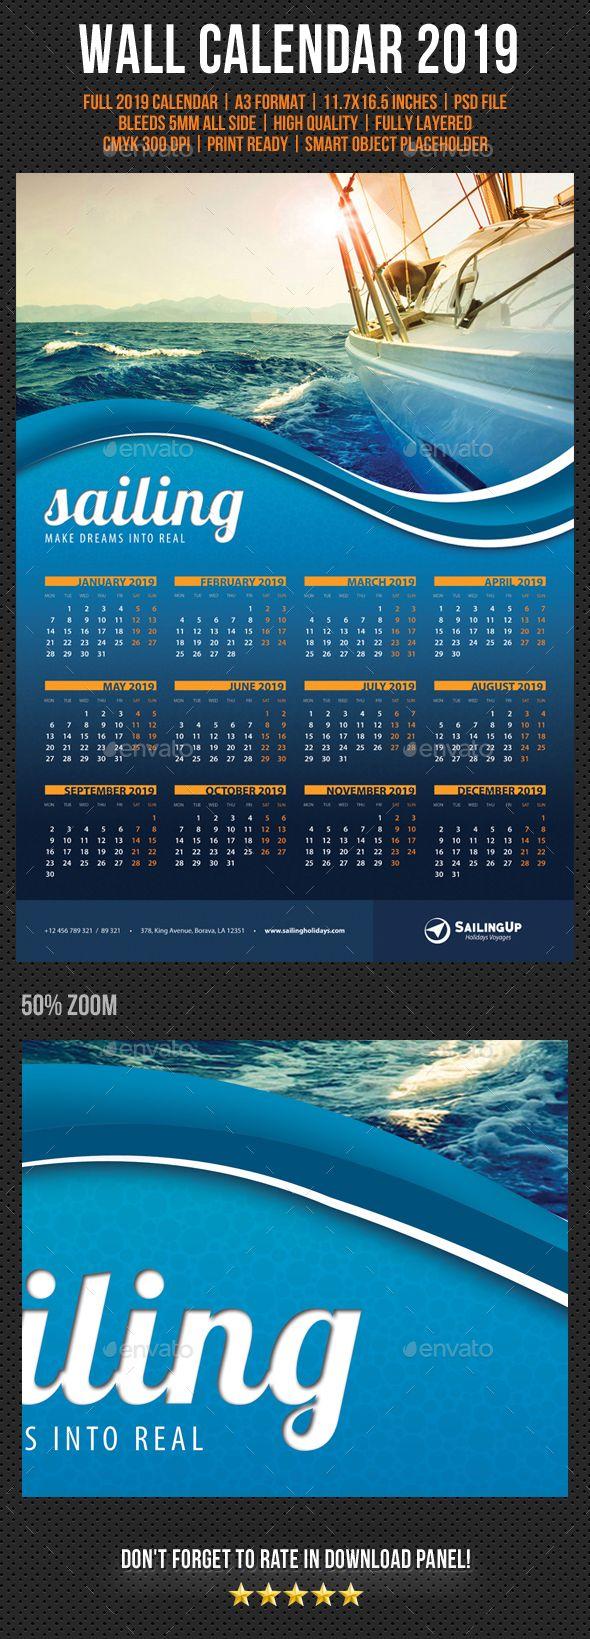 Wall Calendar A3 2021 V01 Wall calendar, Photography